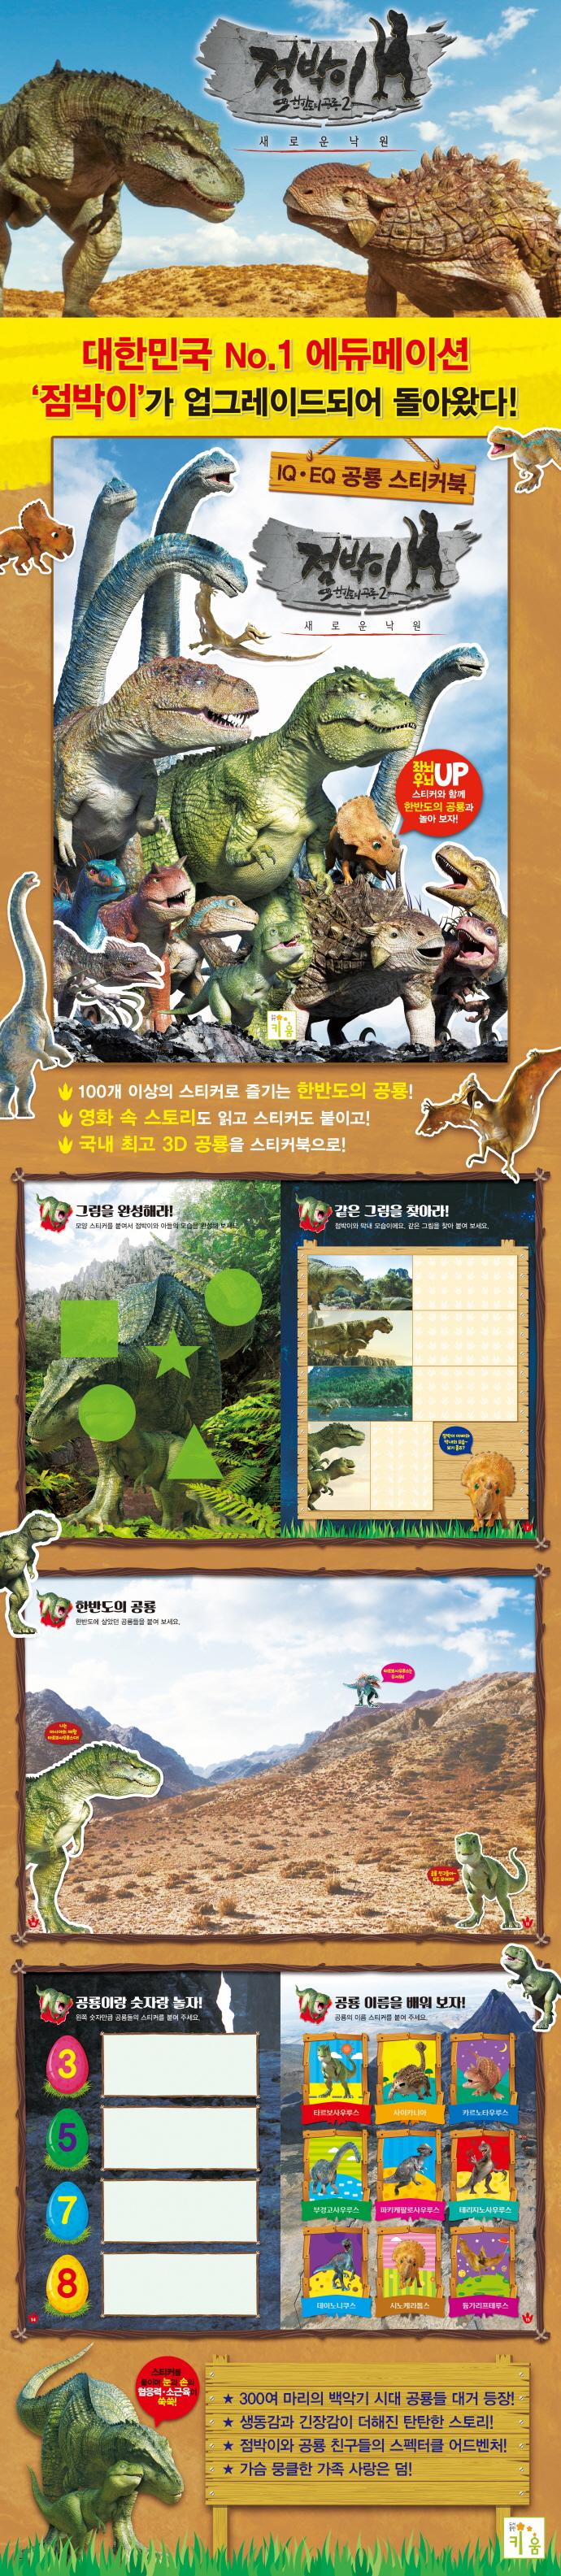 IQ·EQ 공룡 스티커북: 점박이 한반도의 공룡2 도서 상세이미지